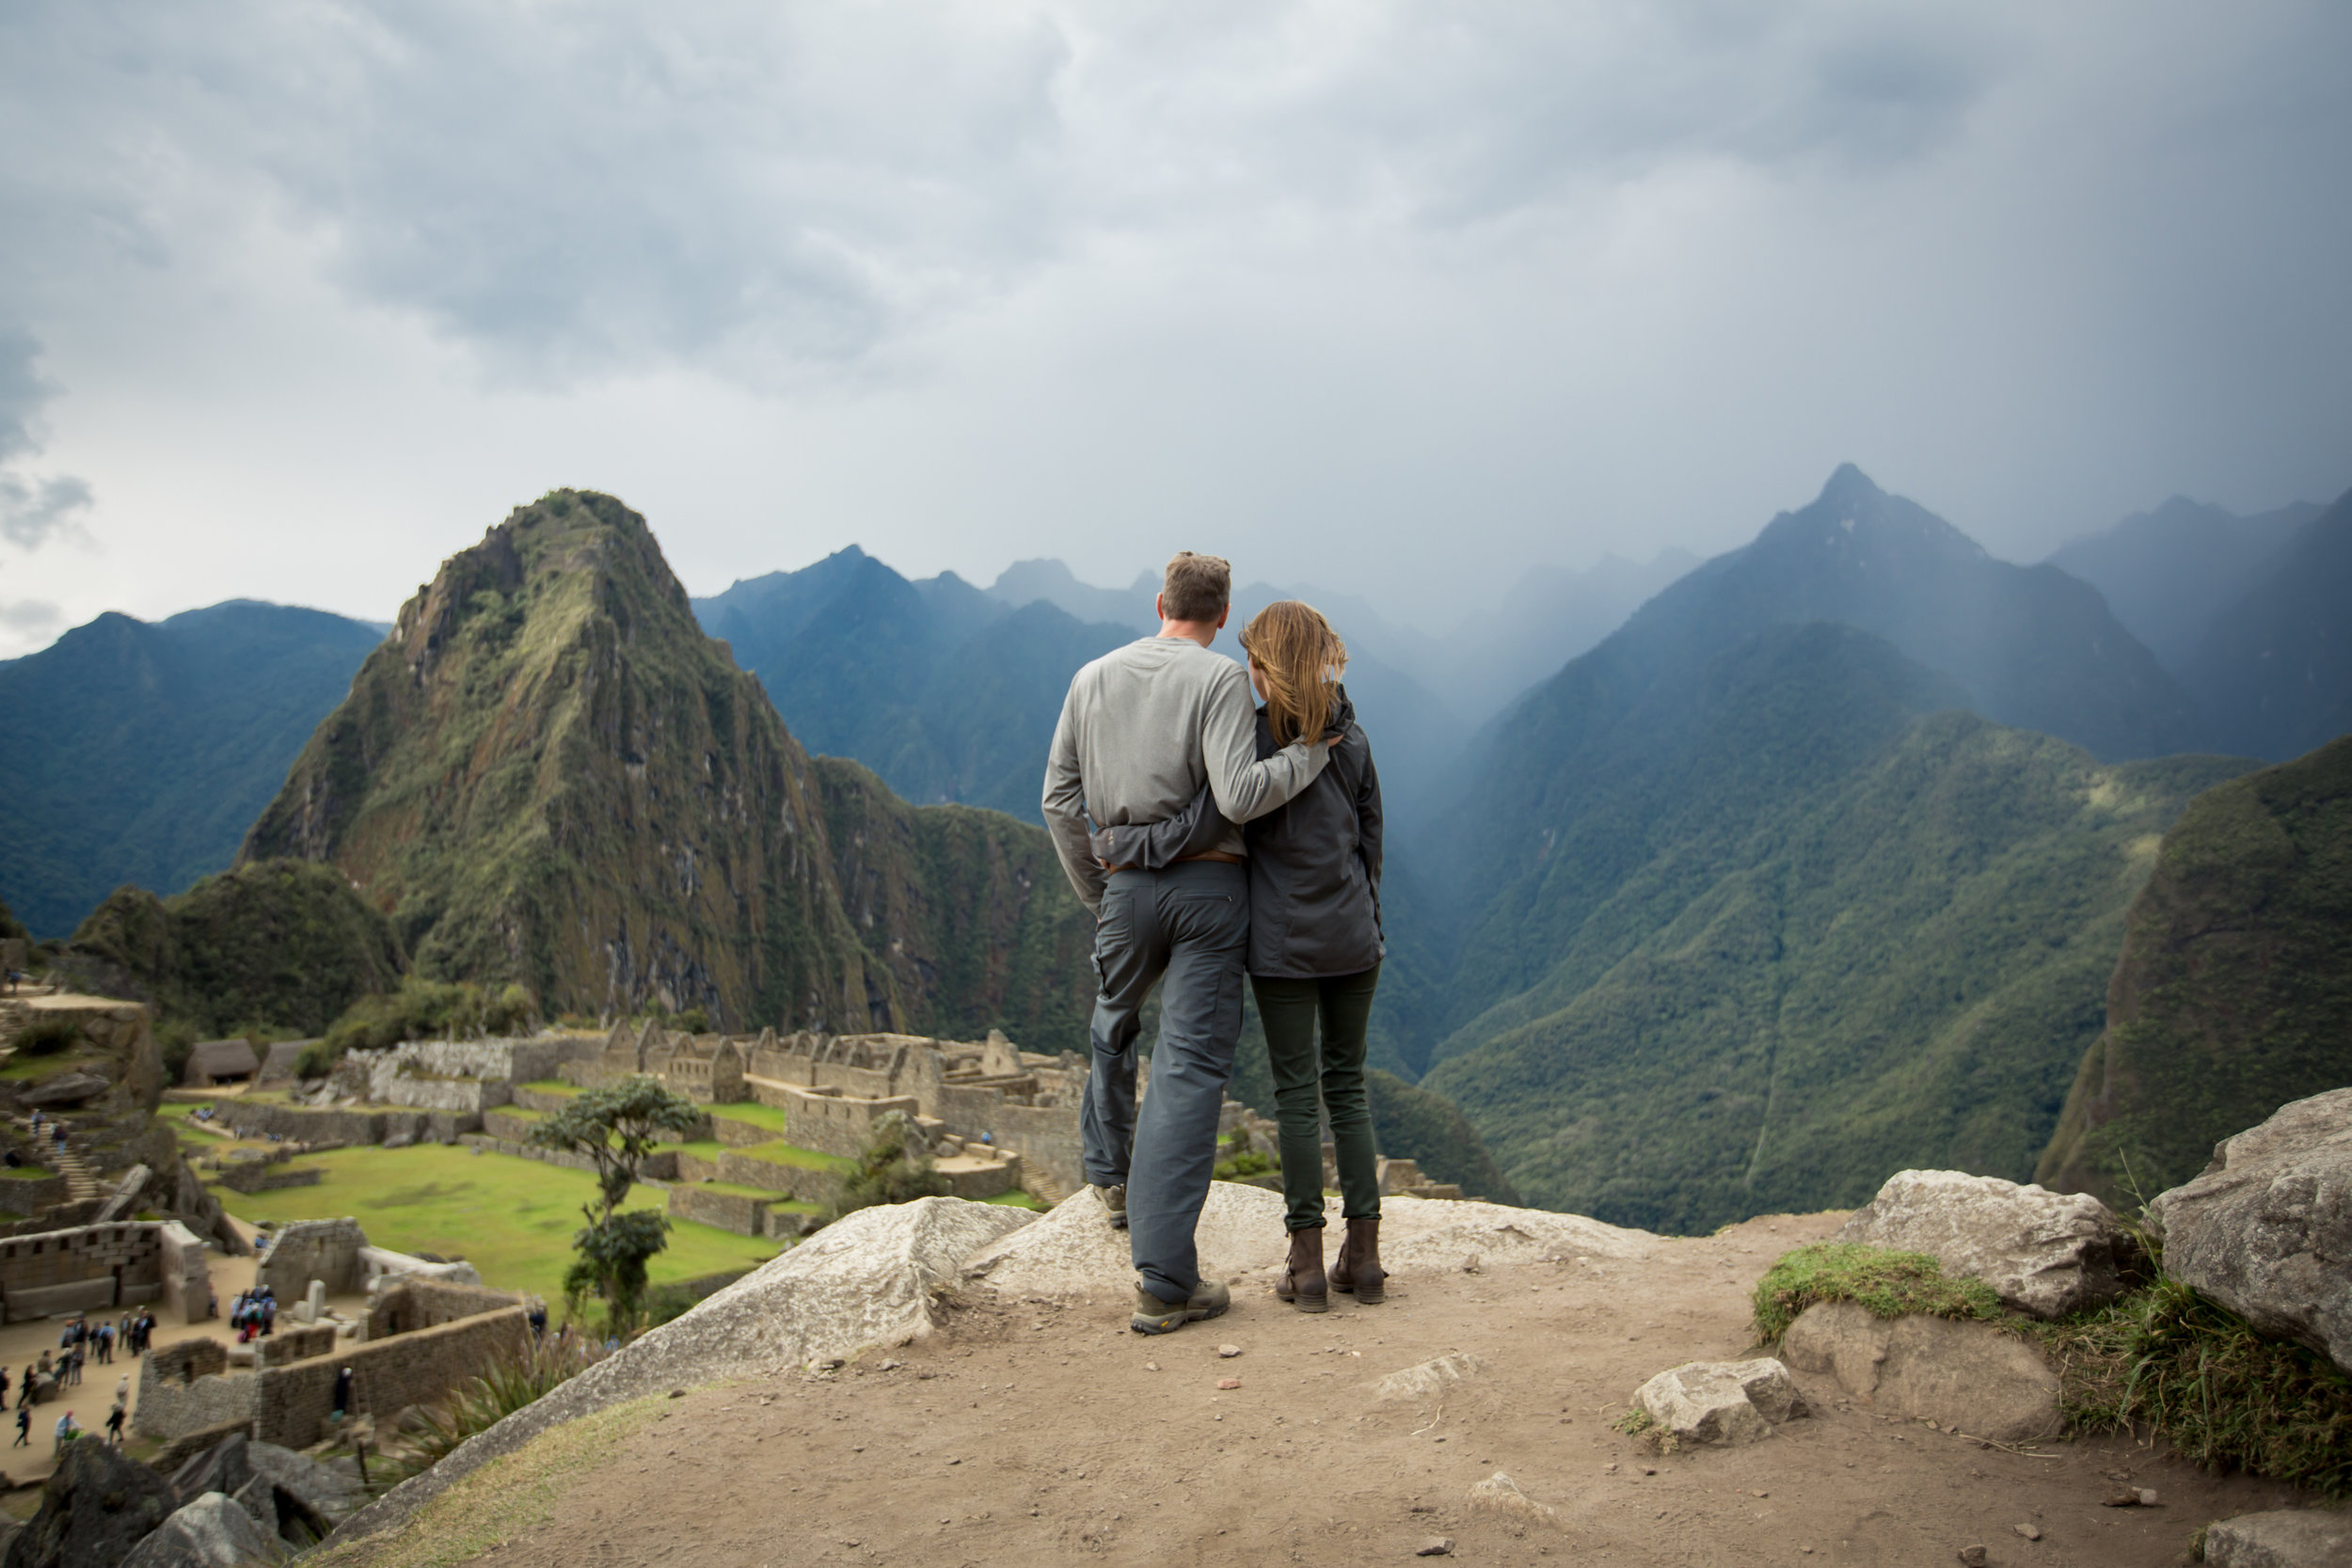 AK_WONDERS_Day_4_Machu Picchu PICCHU-884.jpg